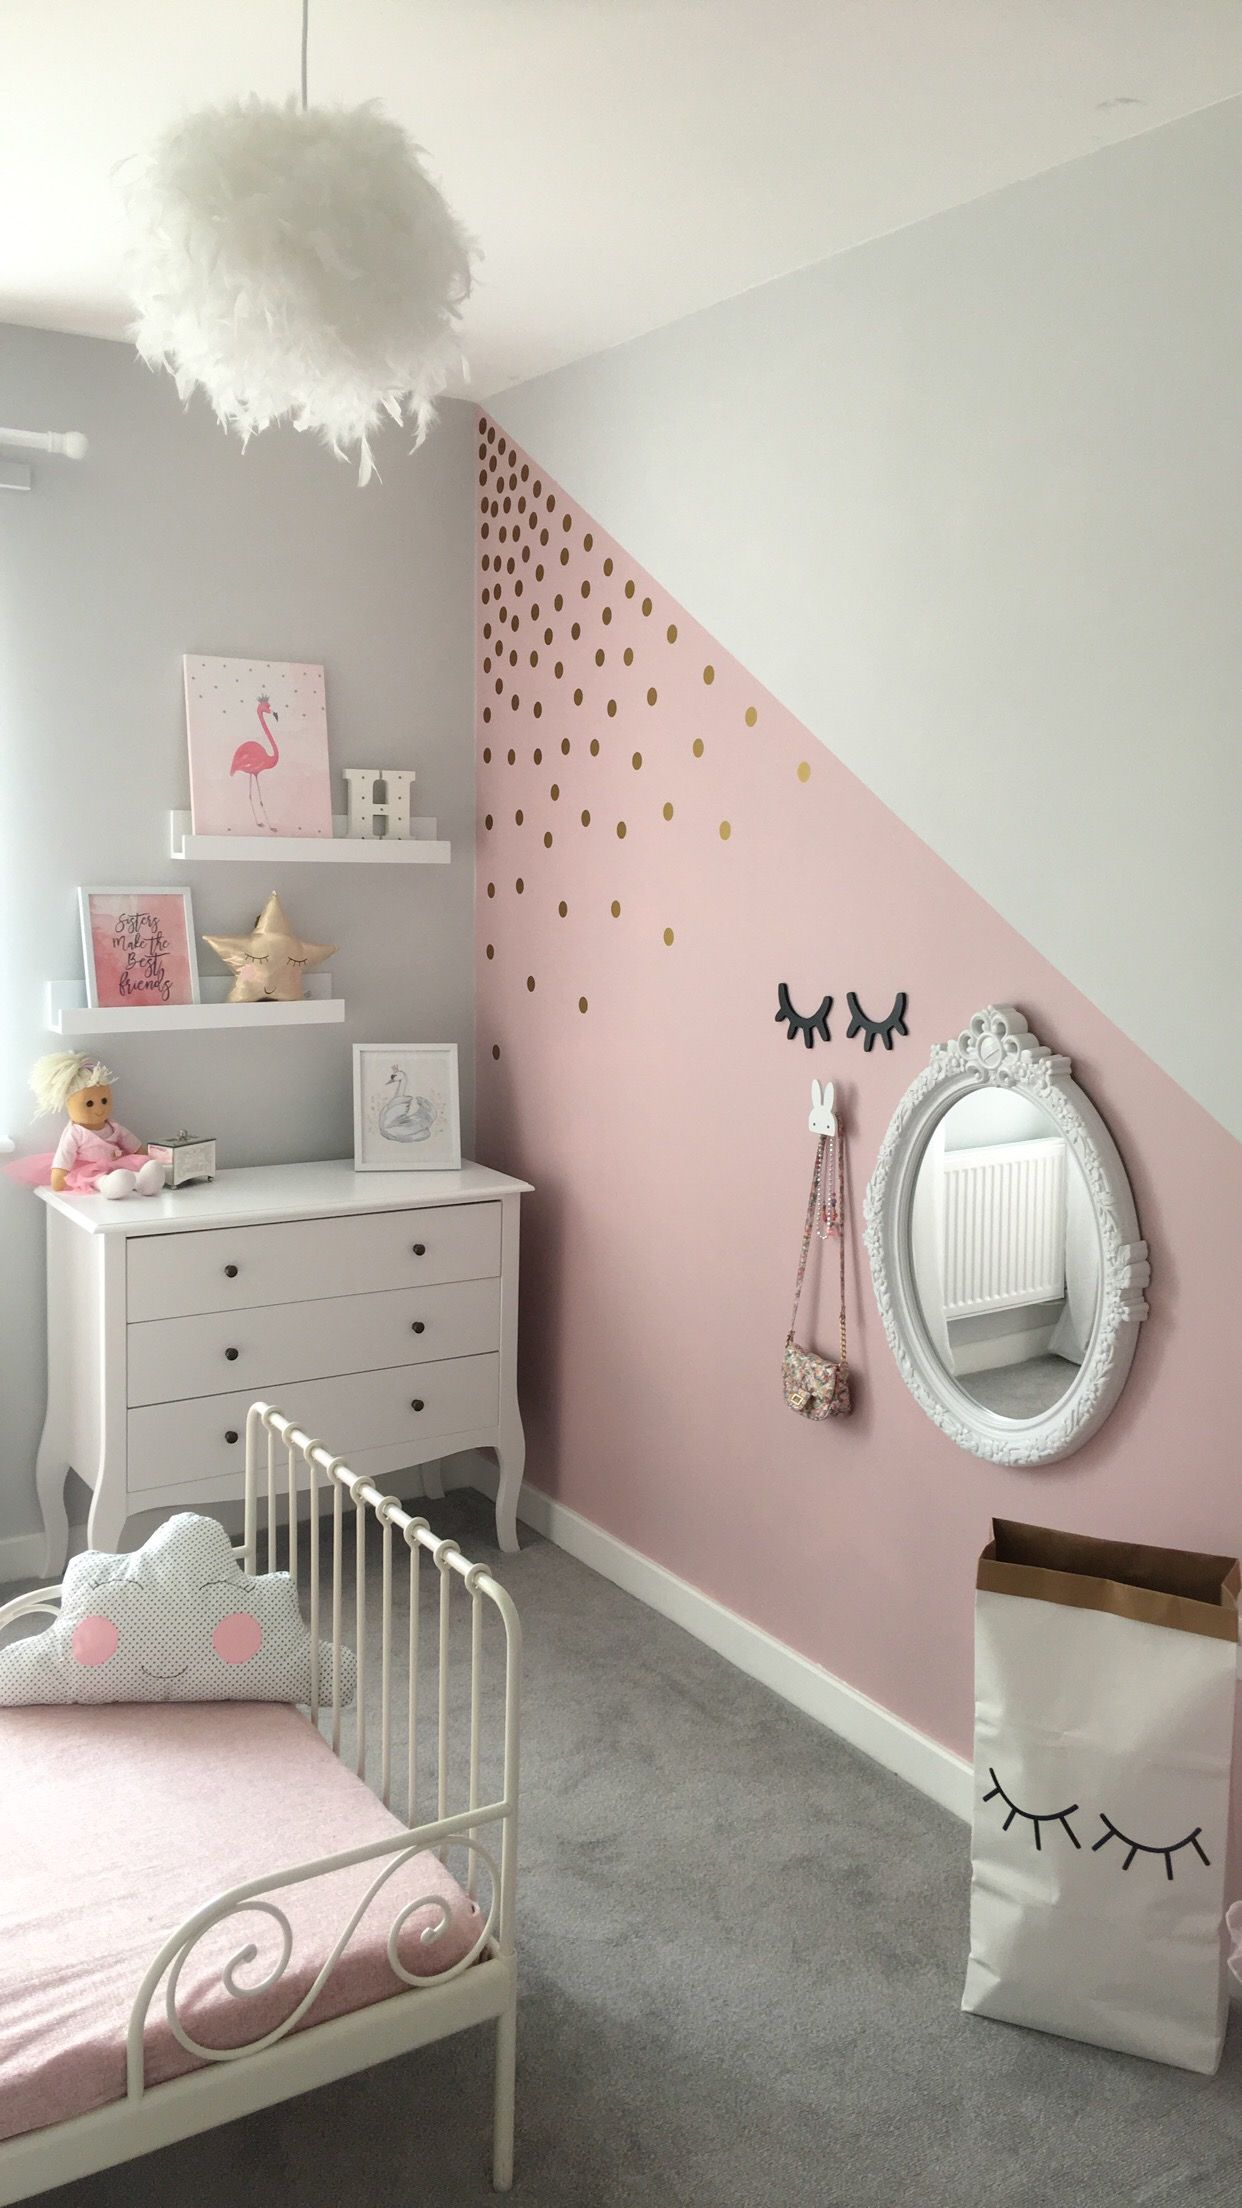 Kids Room Wallpaper Designs: Girls Bedroom Ideas Polka Dot